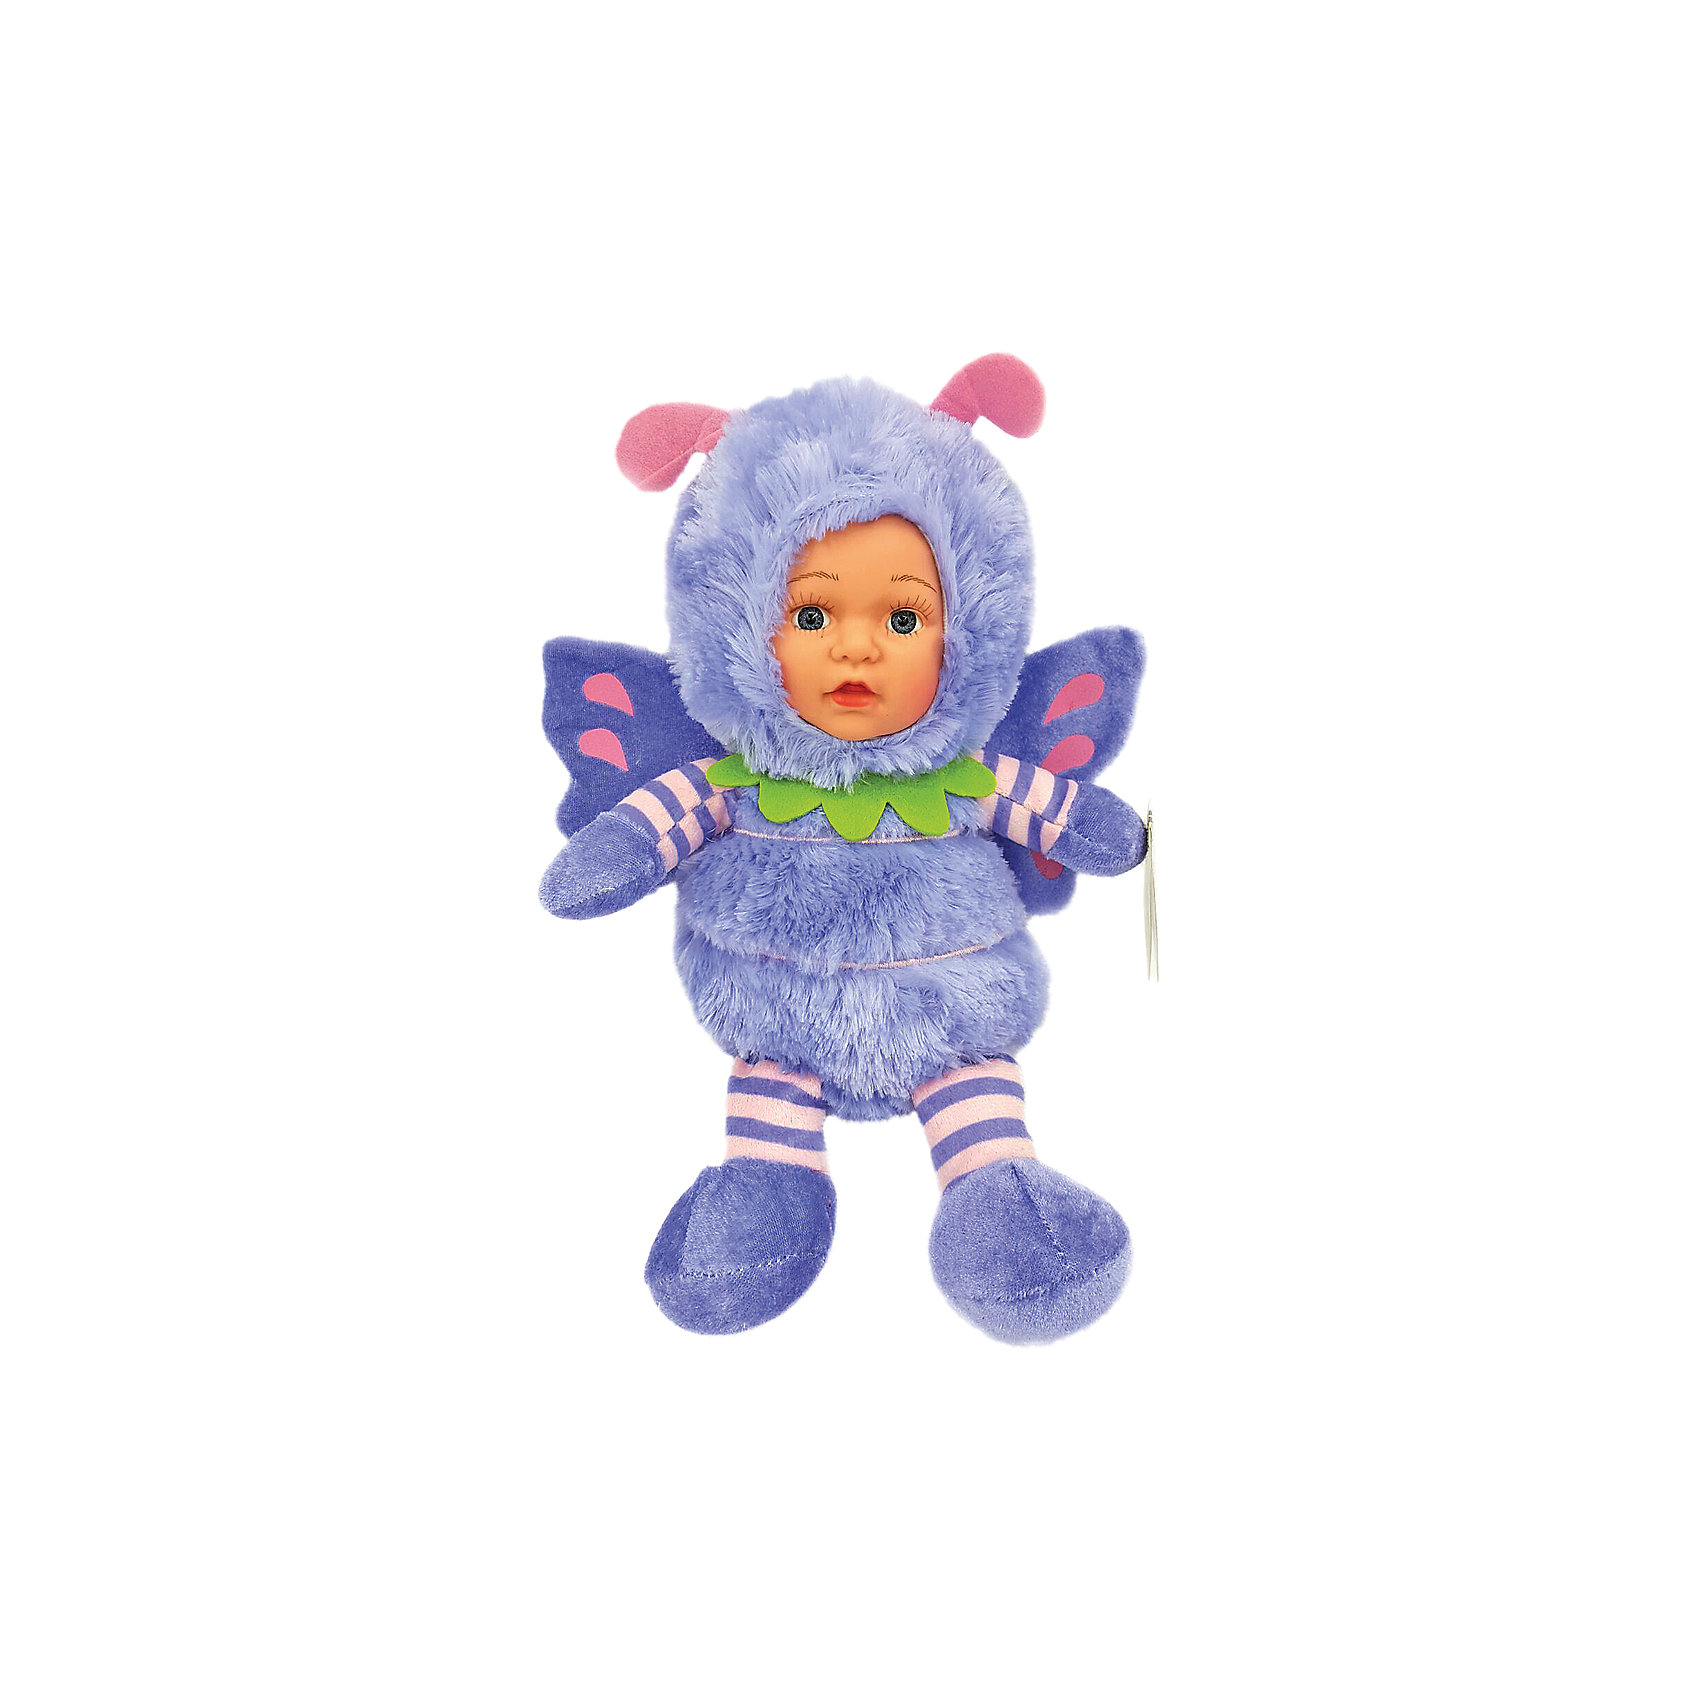 Fluffy Family Игрушка Бабочка, Fluffy Family кукла кана из серии джуку